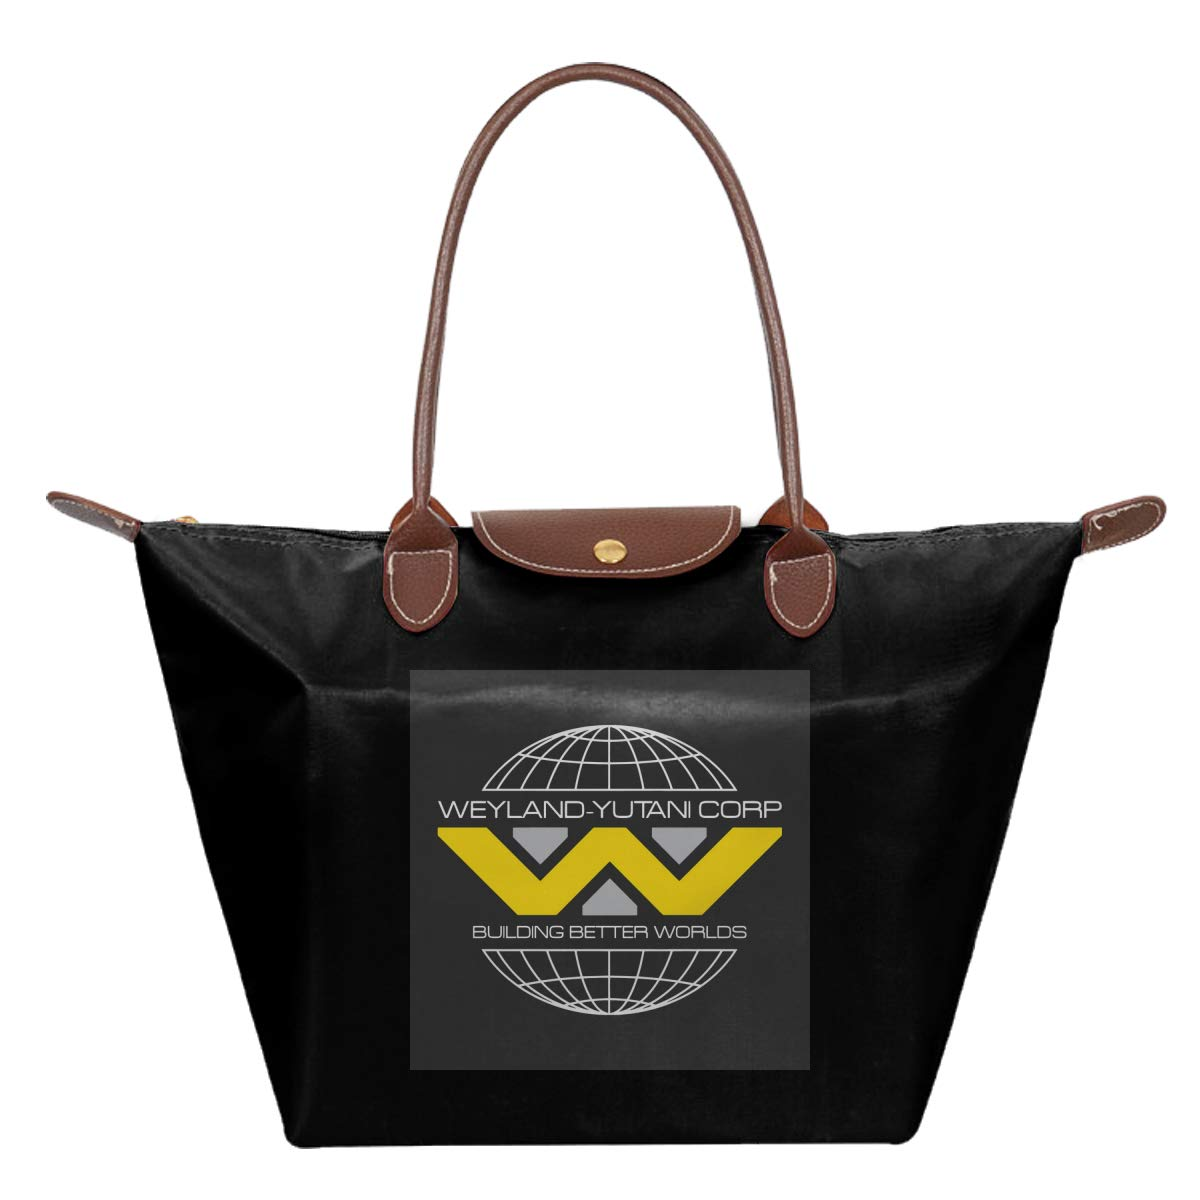 Alien Weyland Yutani Corp Logo Waterproof Leather Folded Messenger Nylon Bag Travel Tote Hopping Folding School Handbags